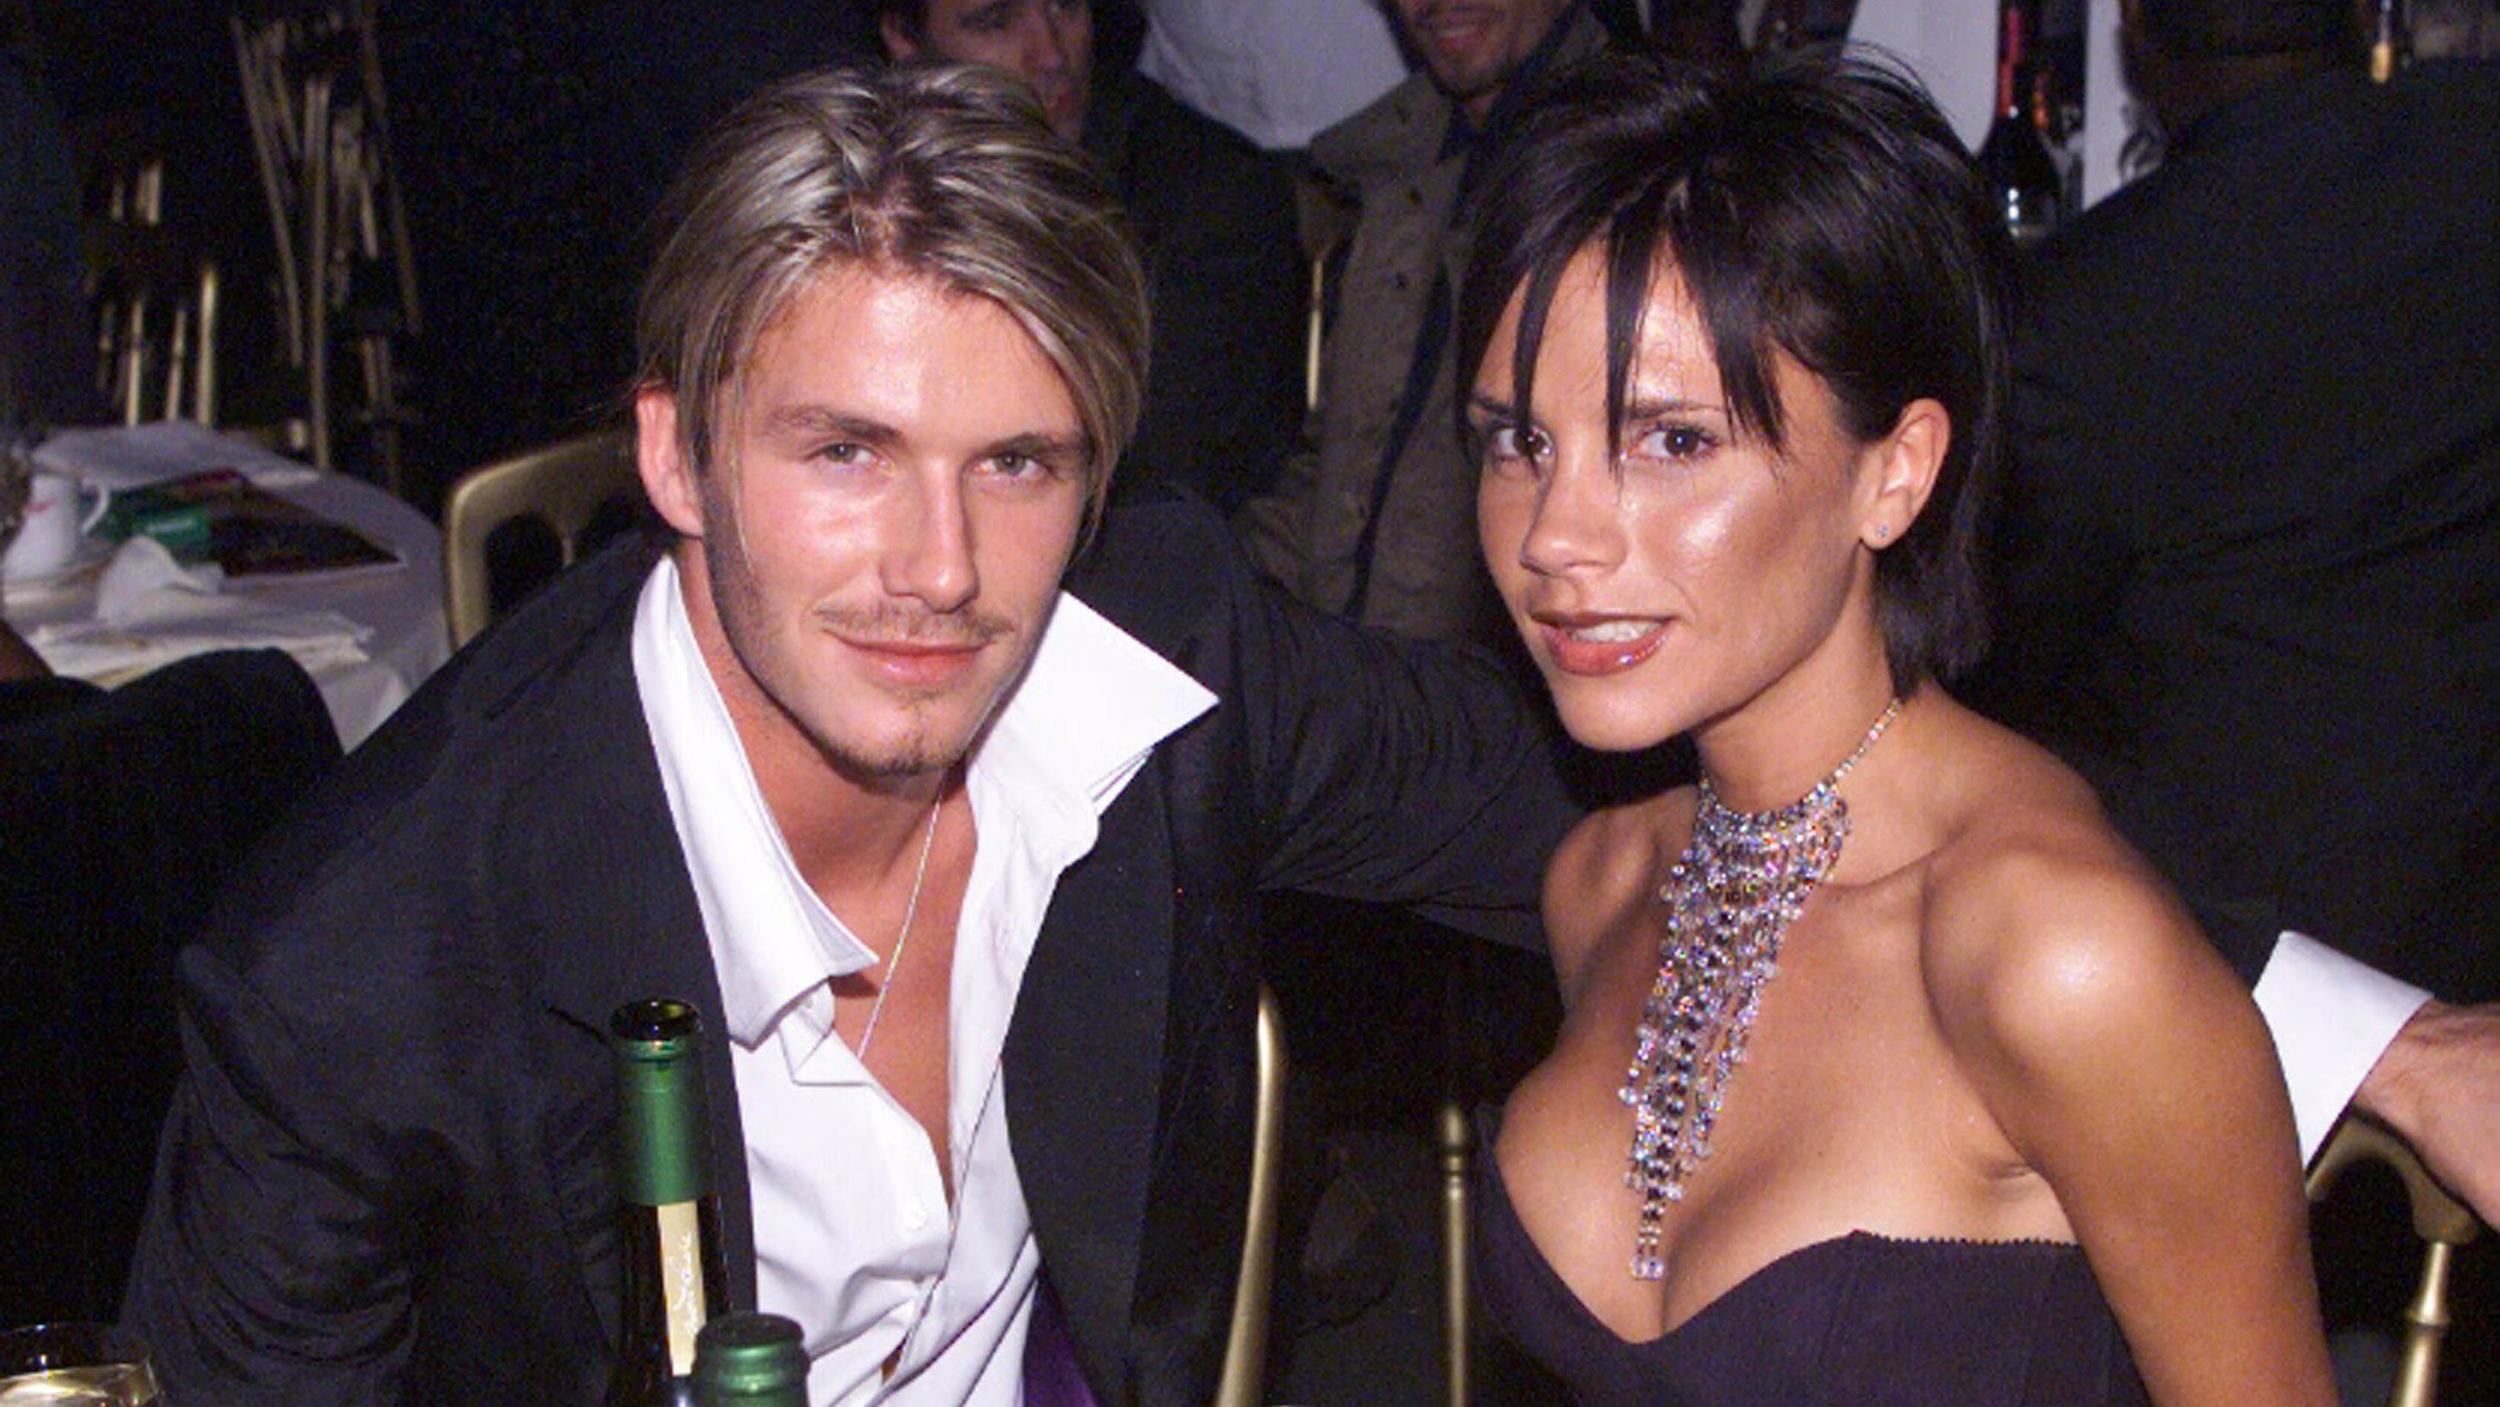 Victoria Beckham Reveals Her Love At First Sight Moment